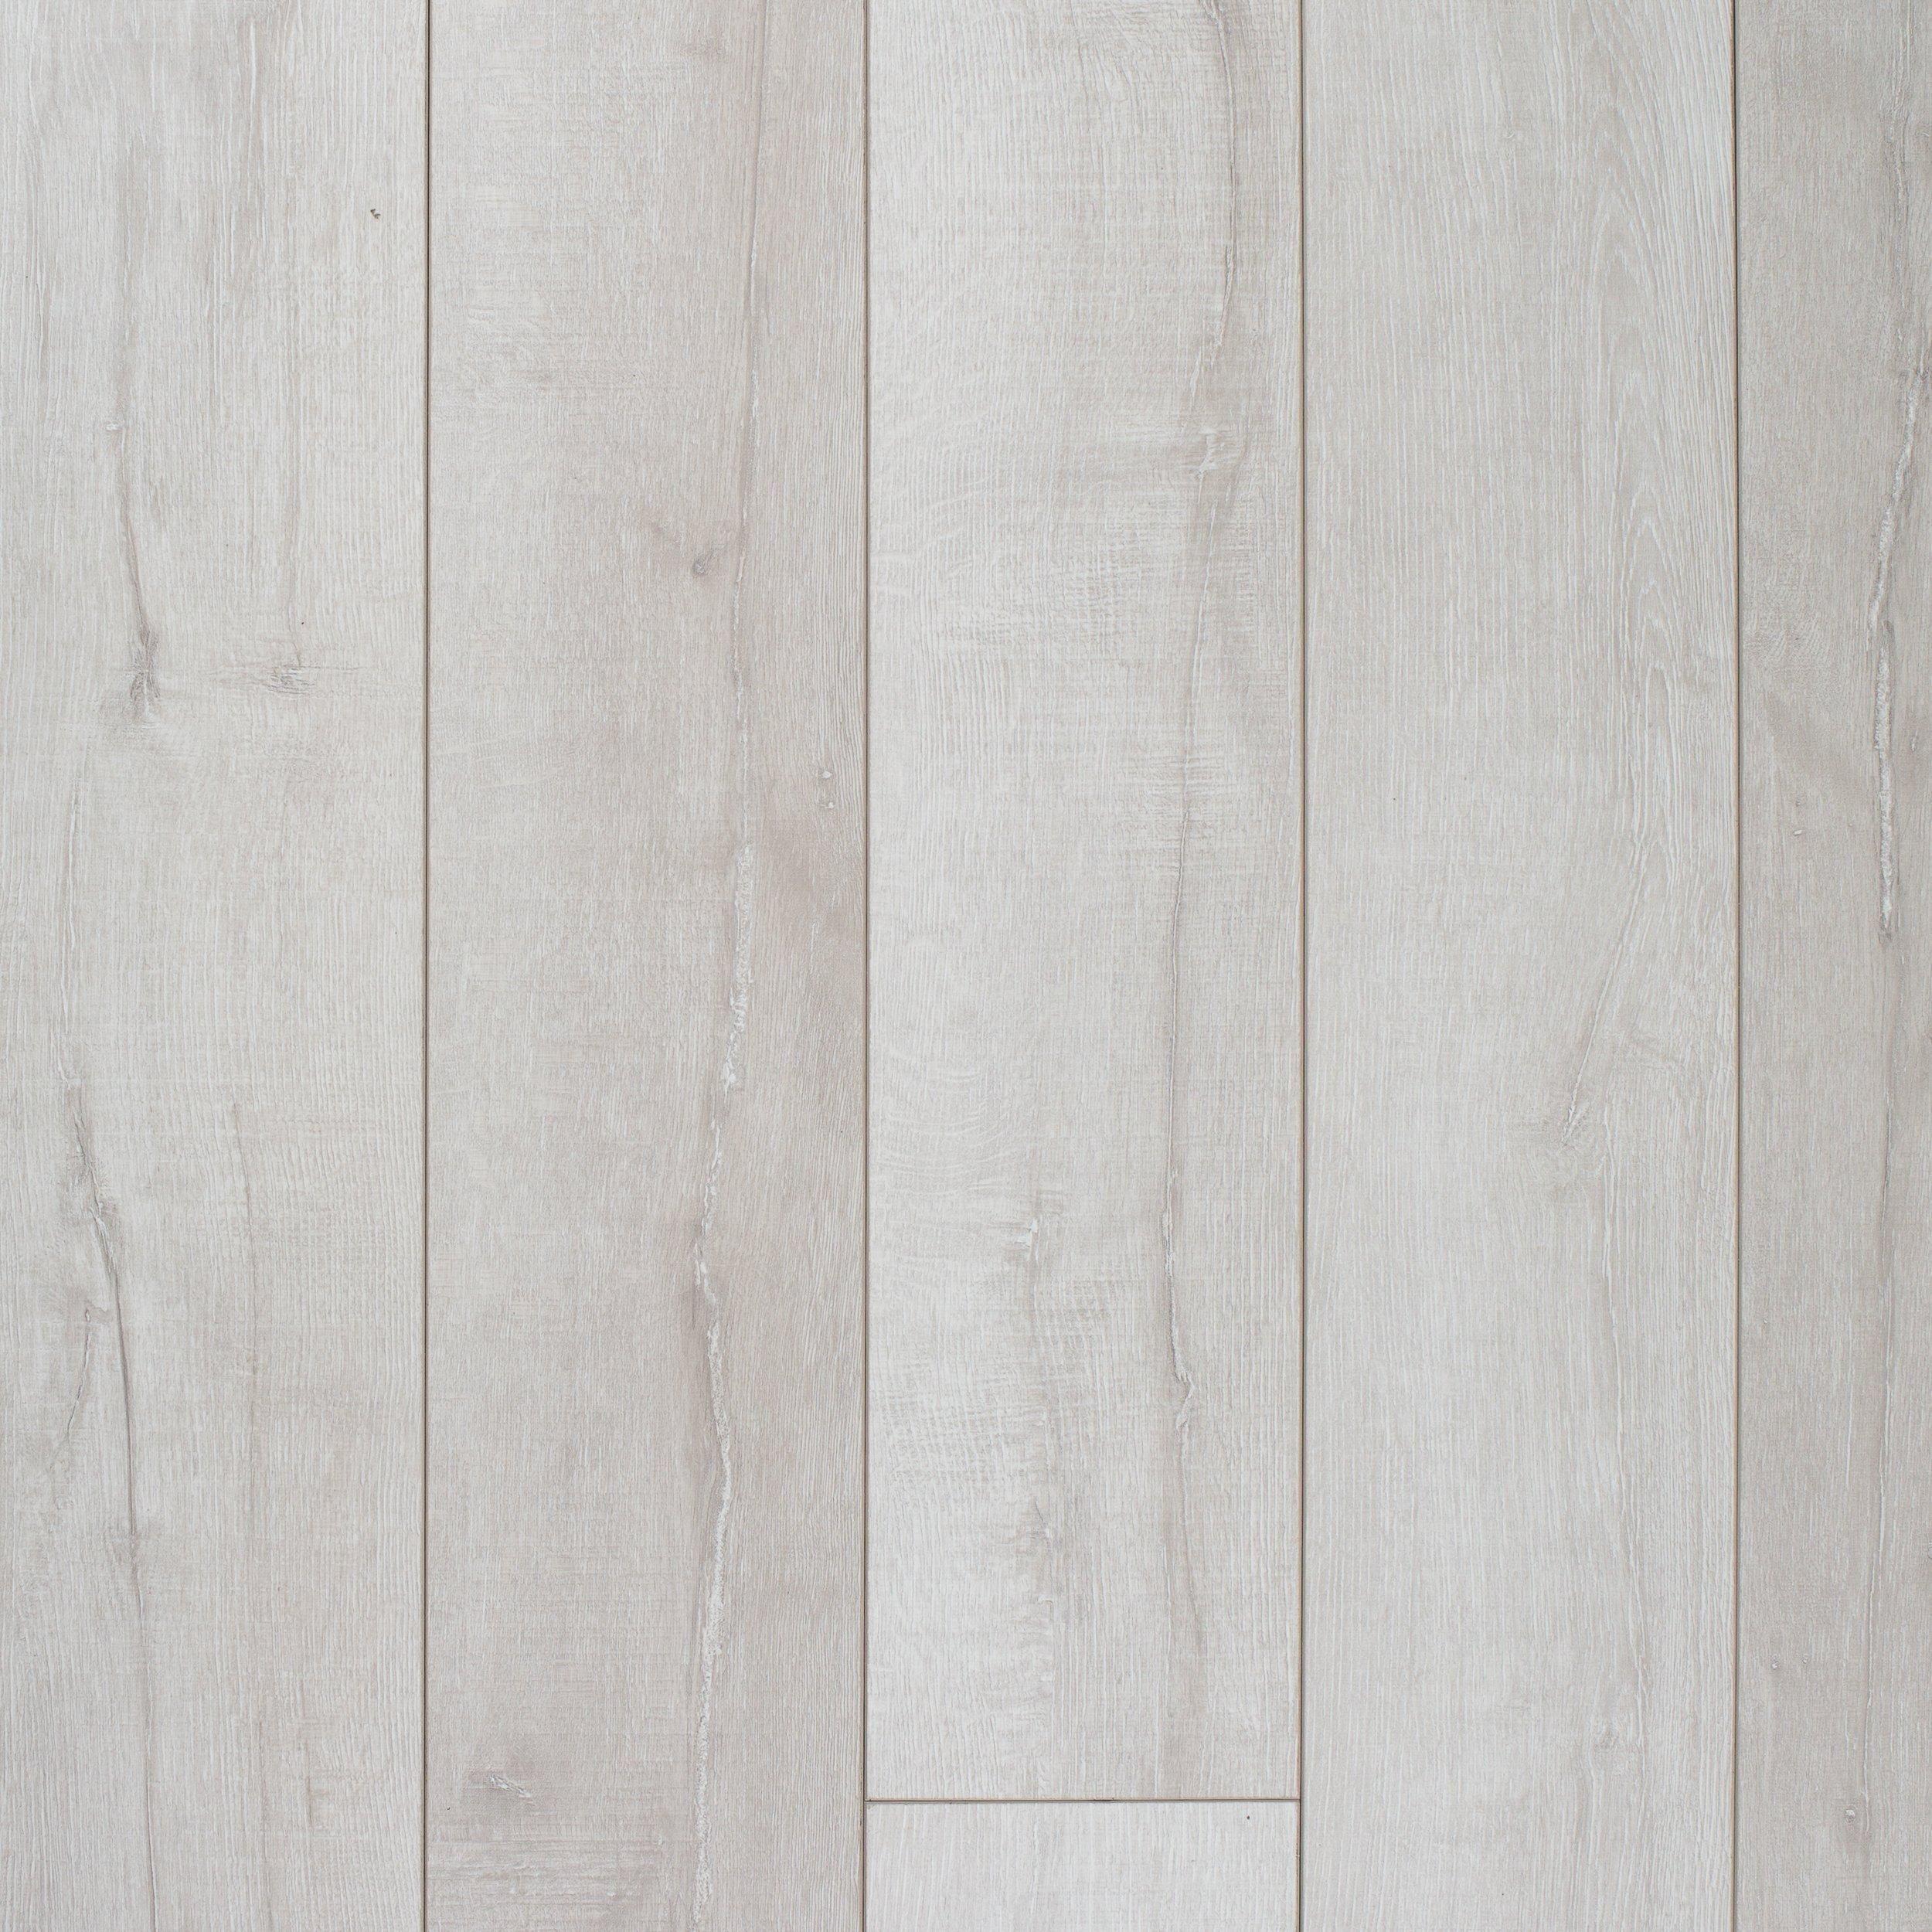 Buff Creme Water Resistant Laminate In 2019 Flooring Wide